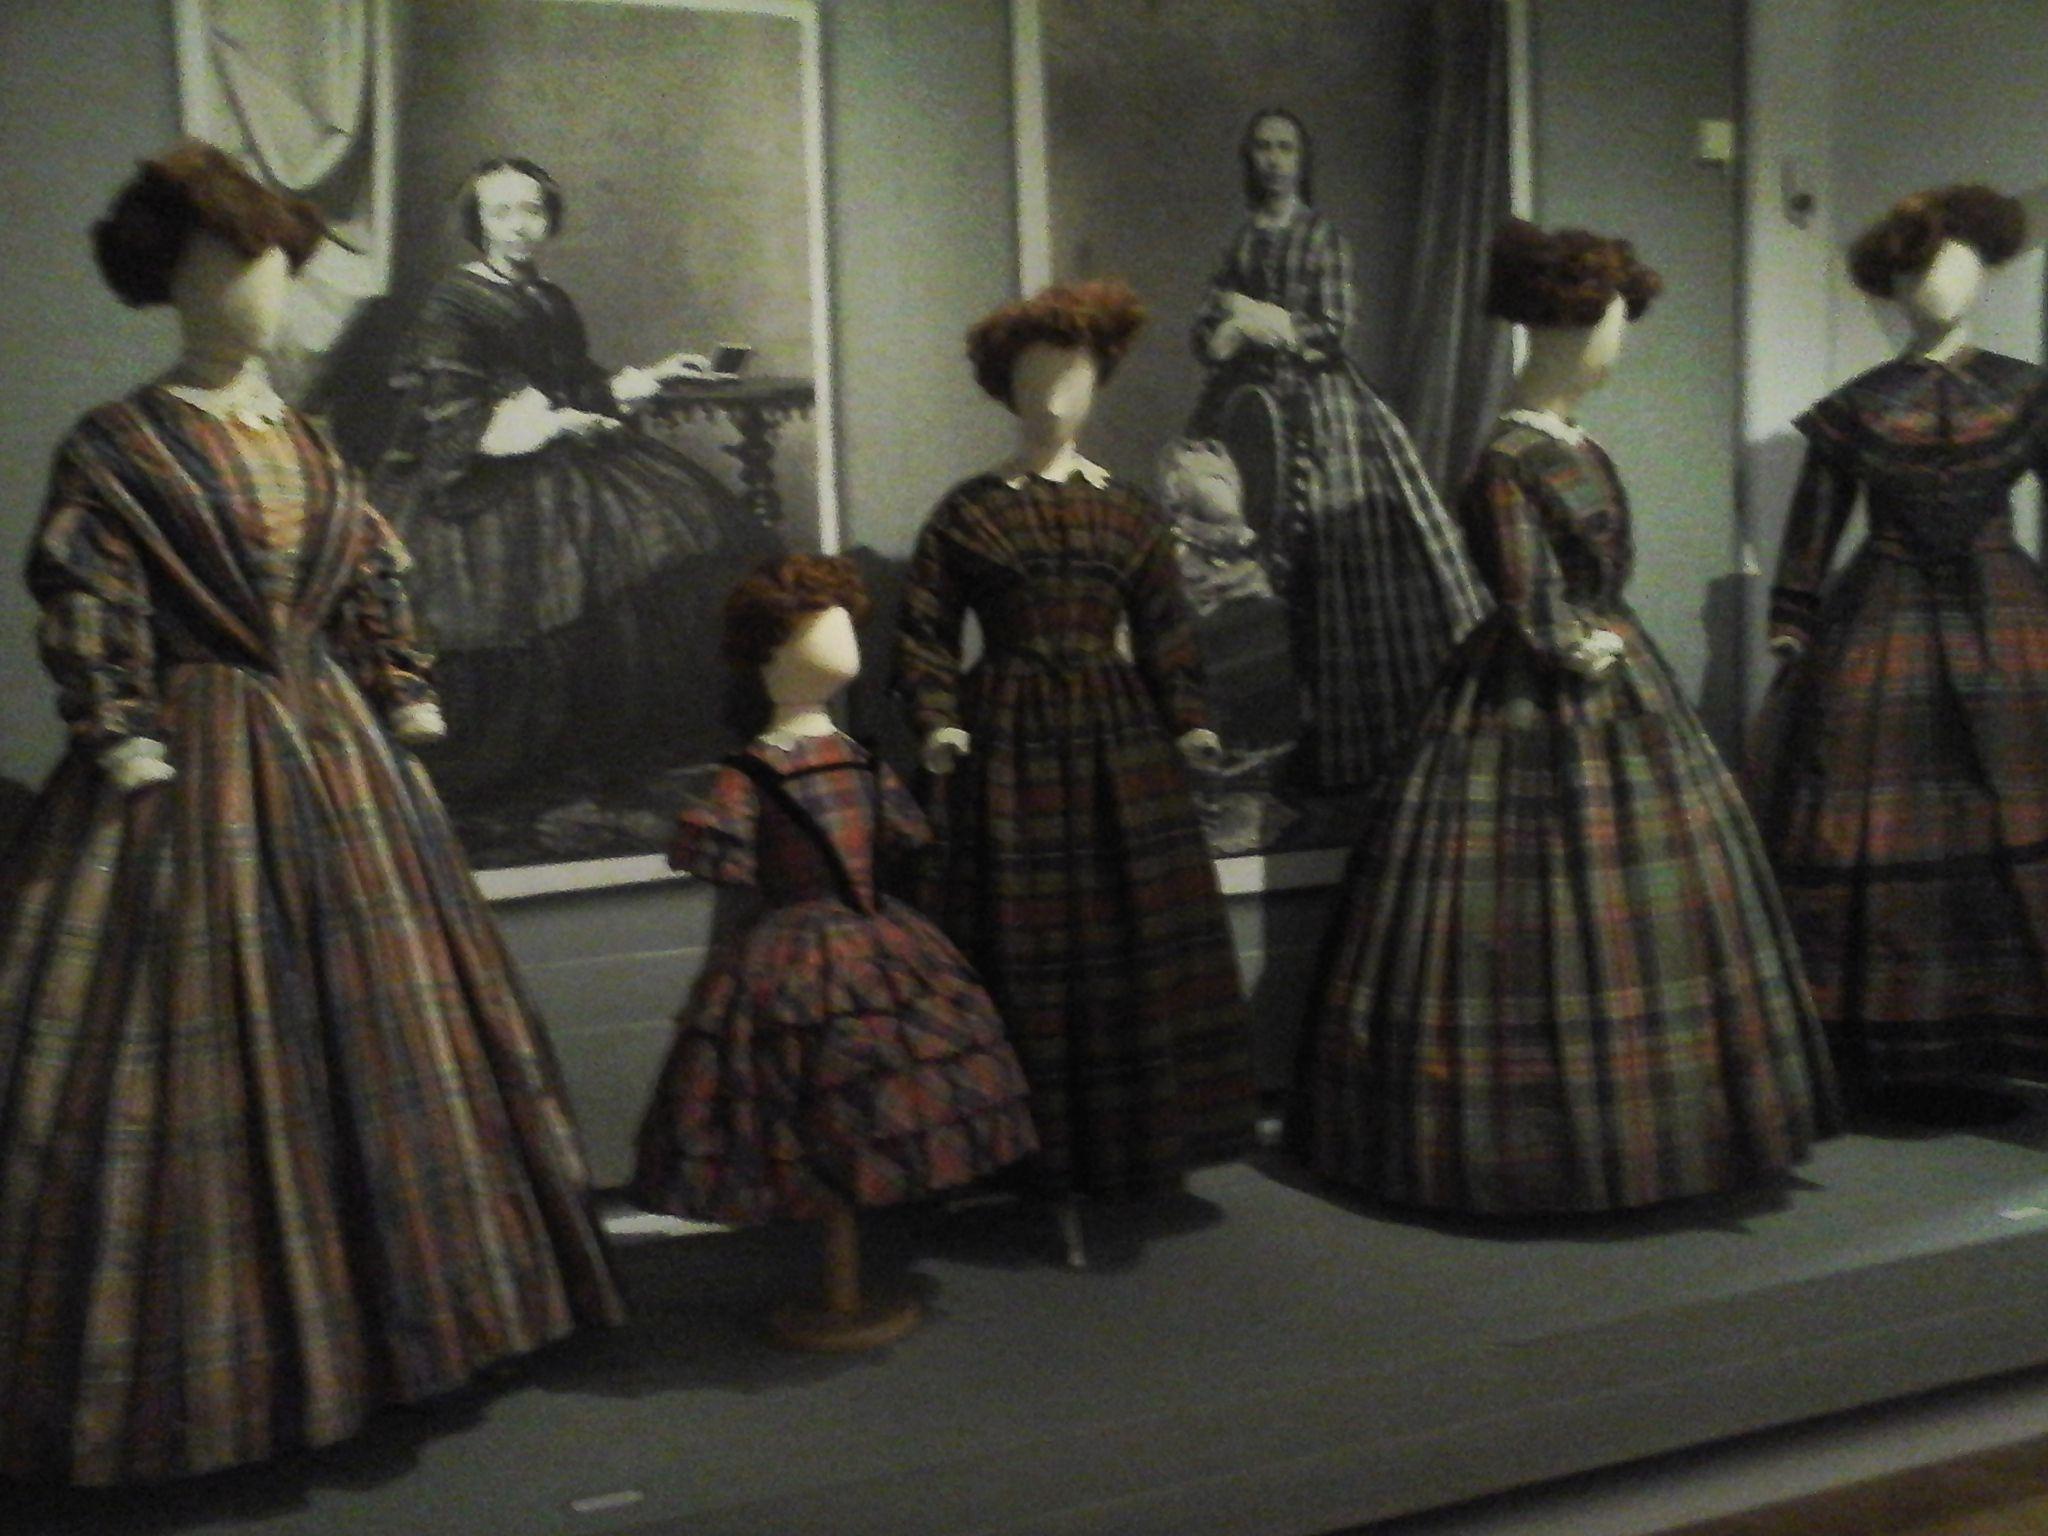 Romantic Fashion - Gemeentemuseum Den Haag